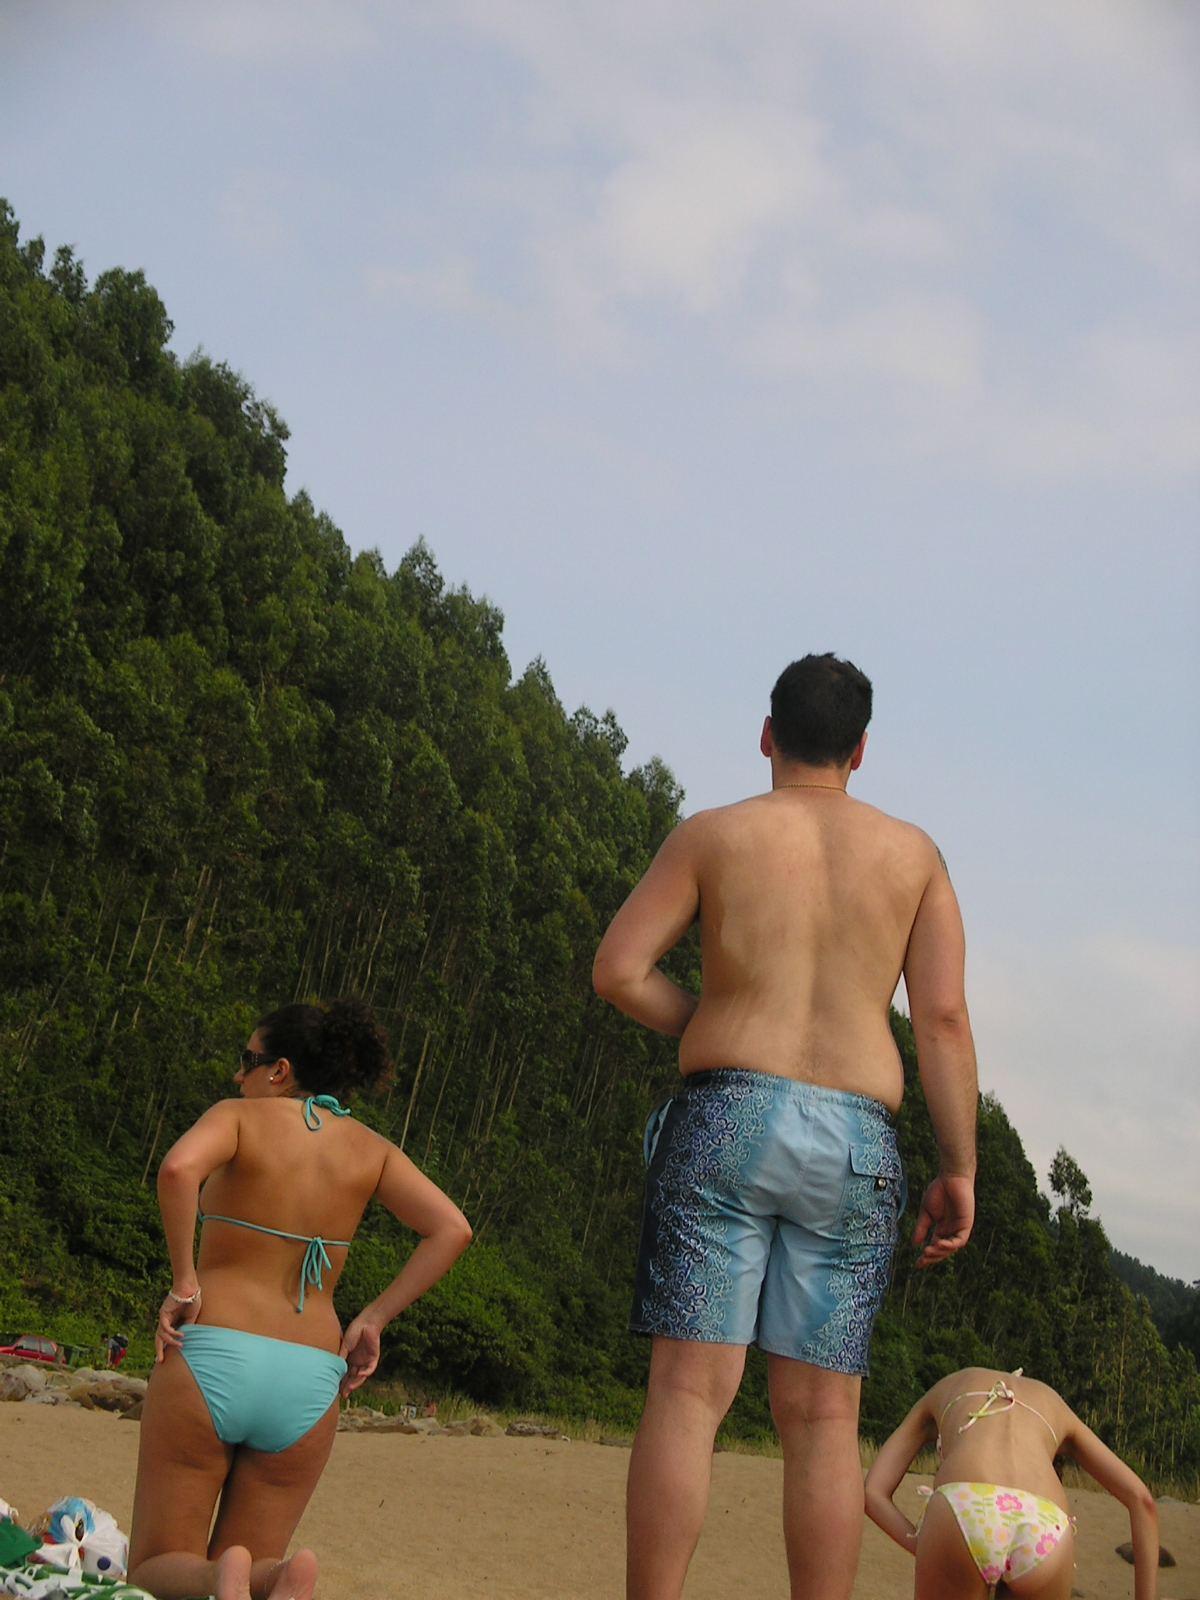 hot naked girls with guys having sex